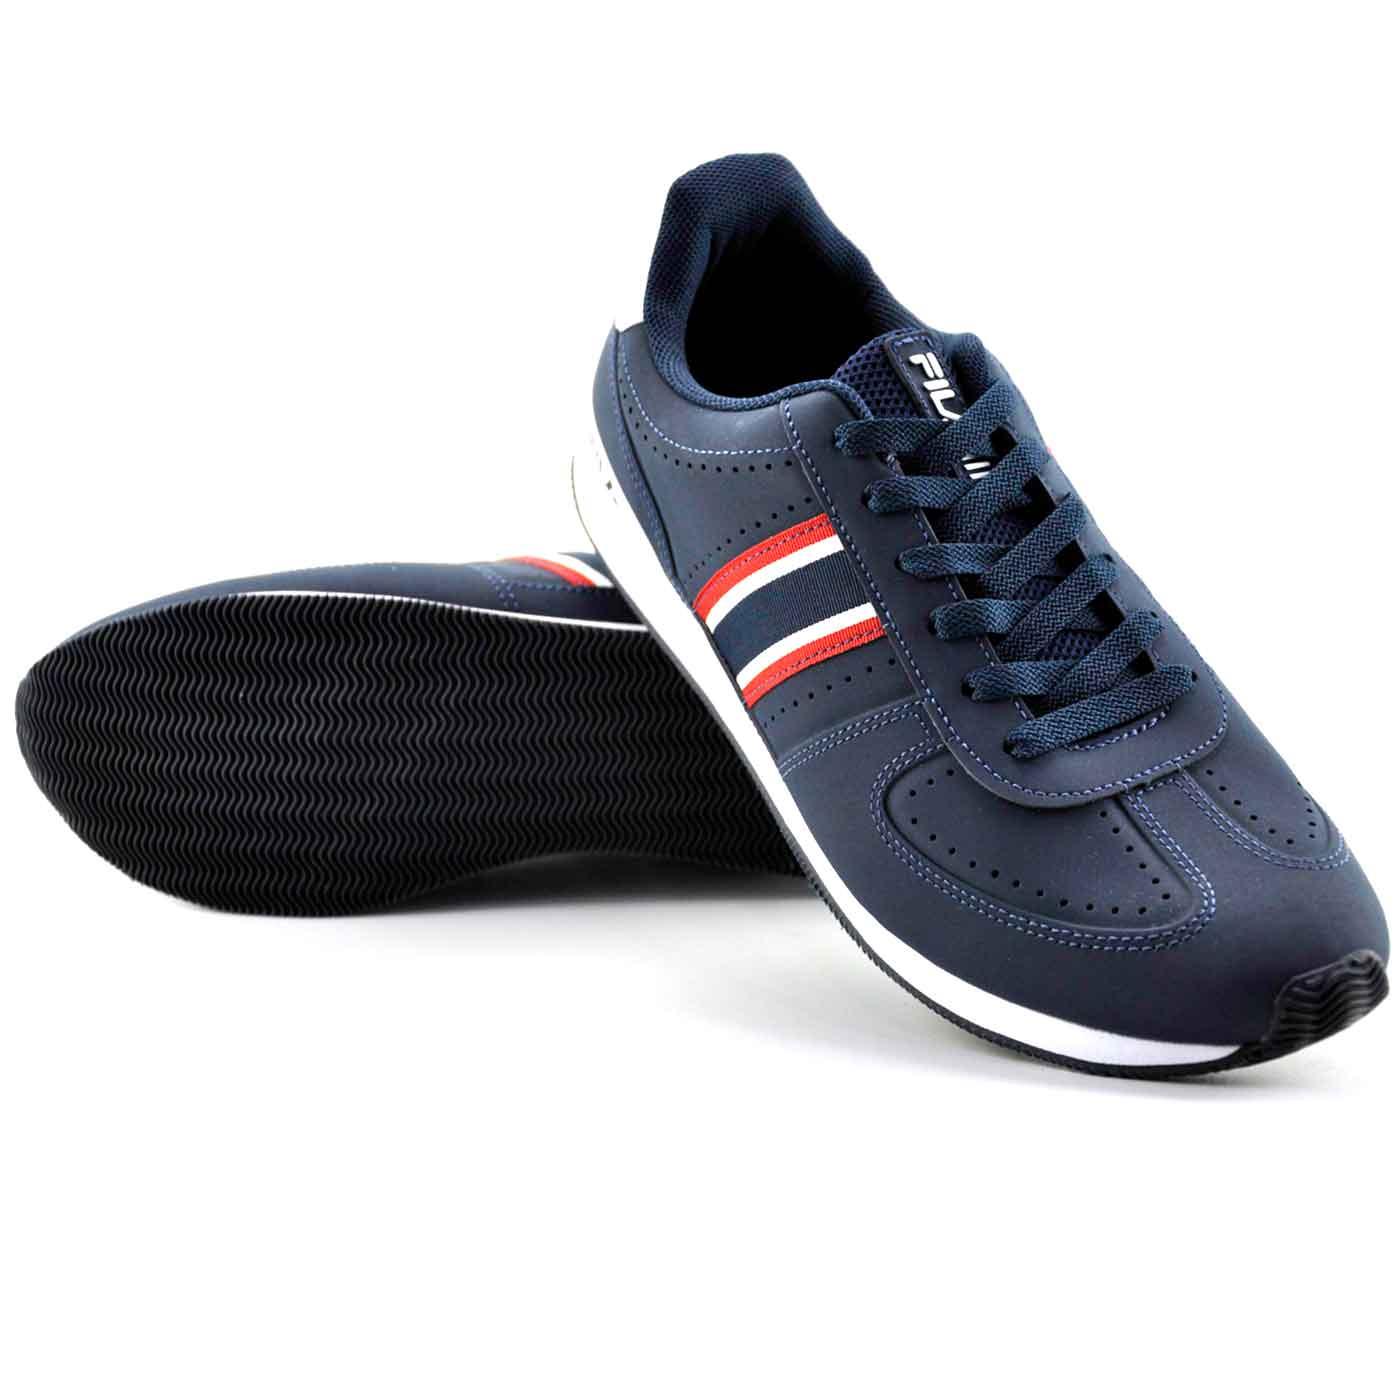 TENIS FILA MEN FOOTWEAR RETRO SPORT - 11U352X